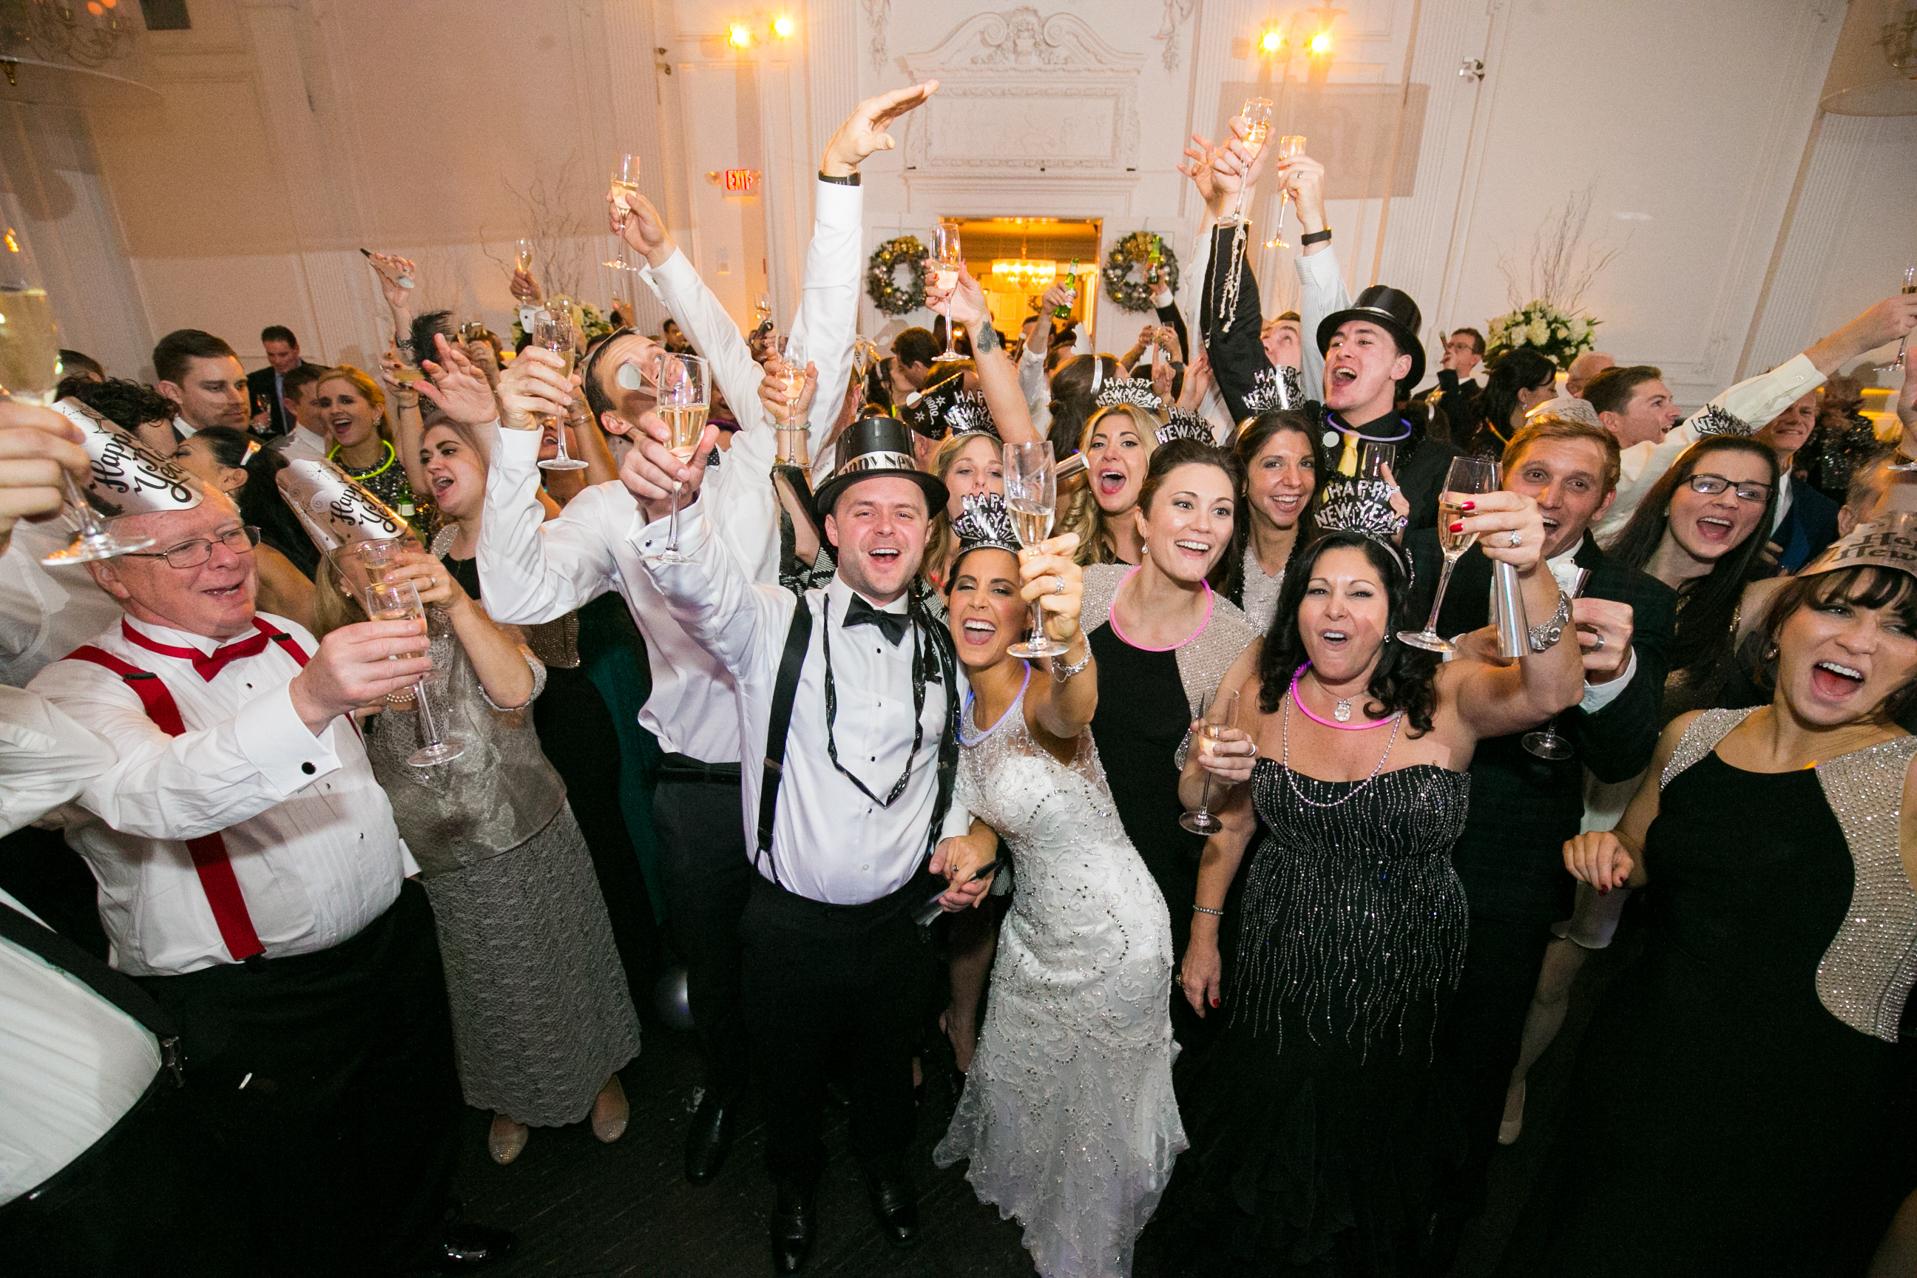 Best New Year's Eve wedding